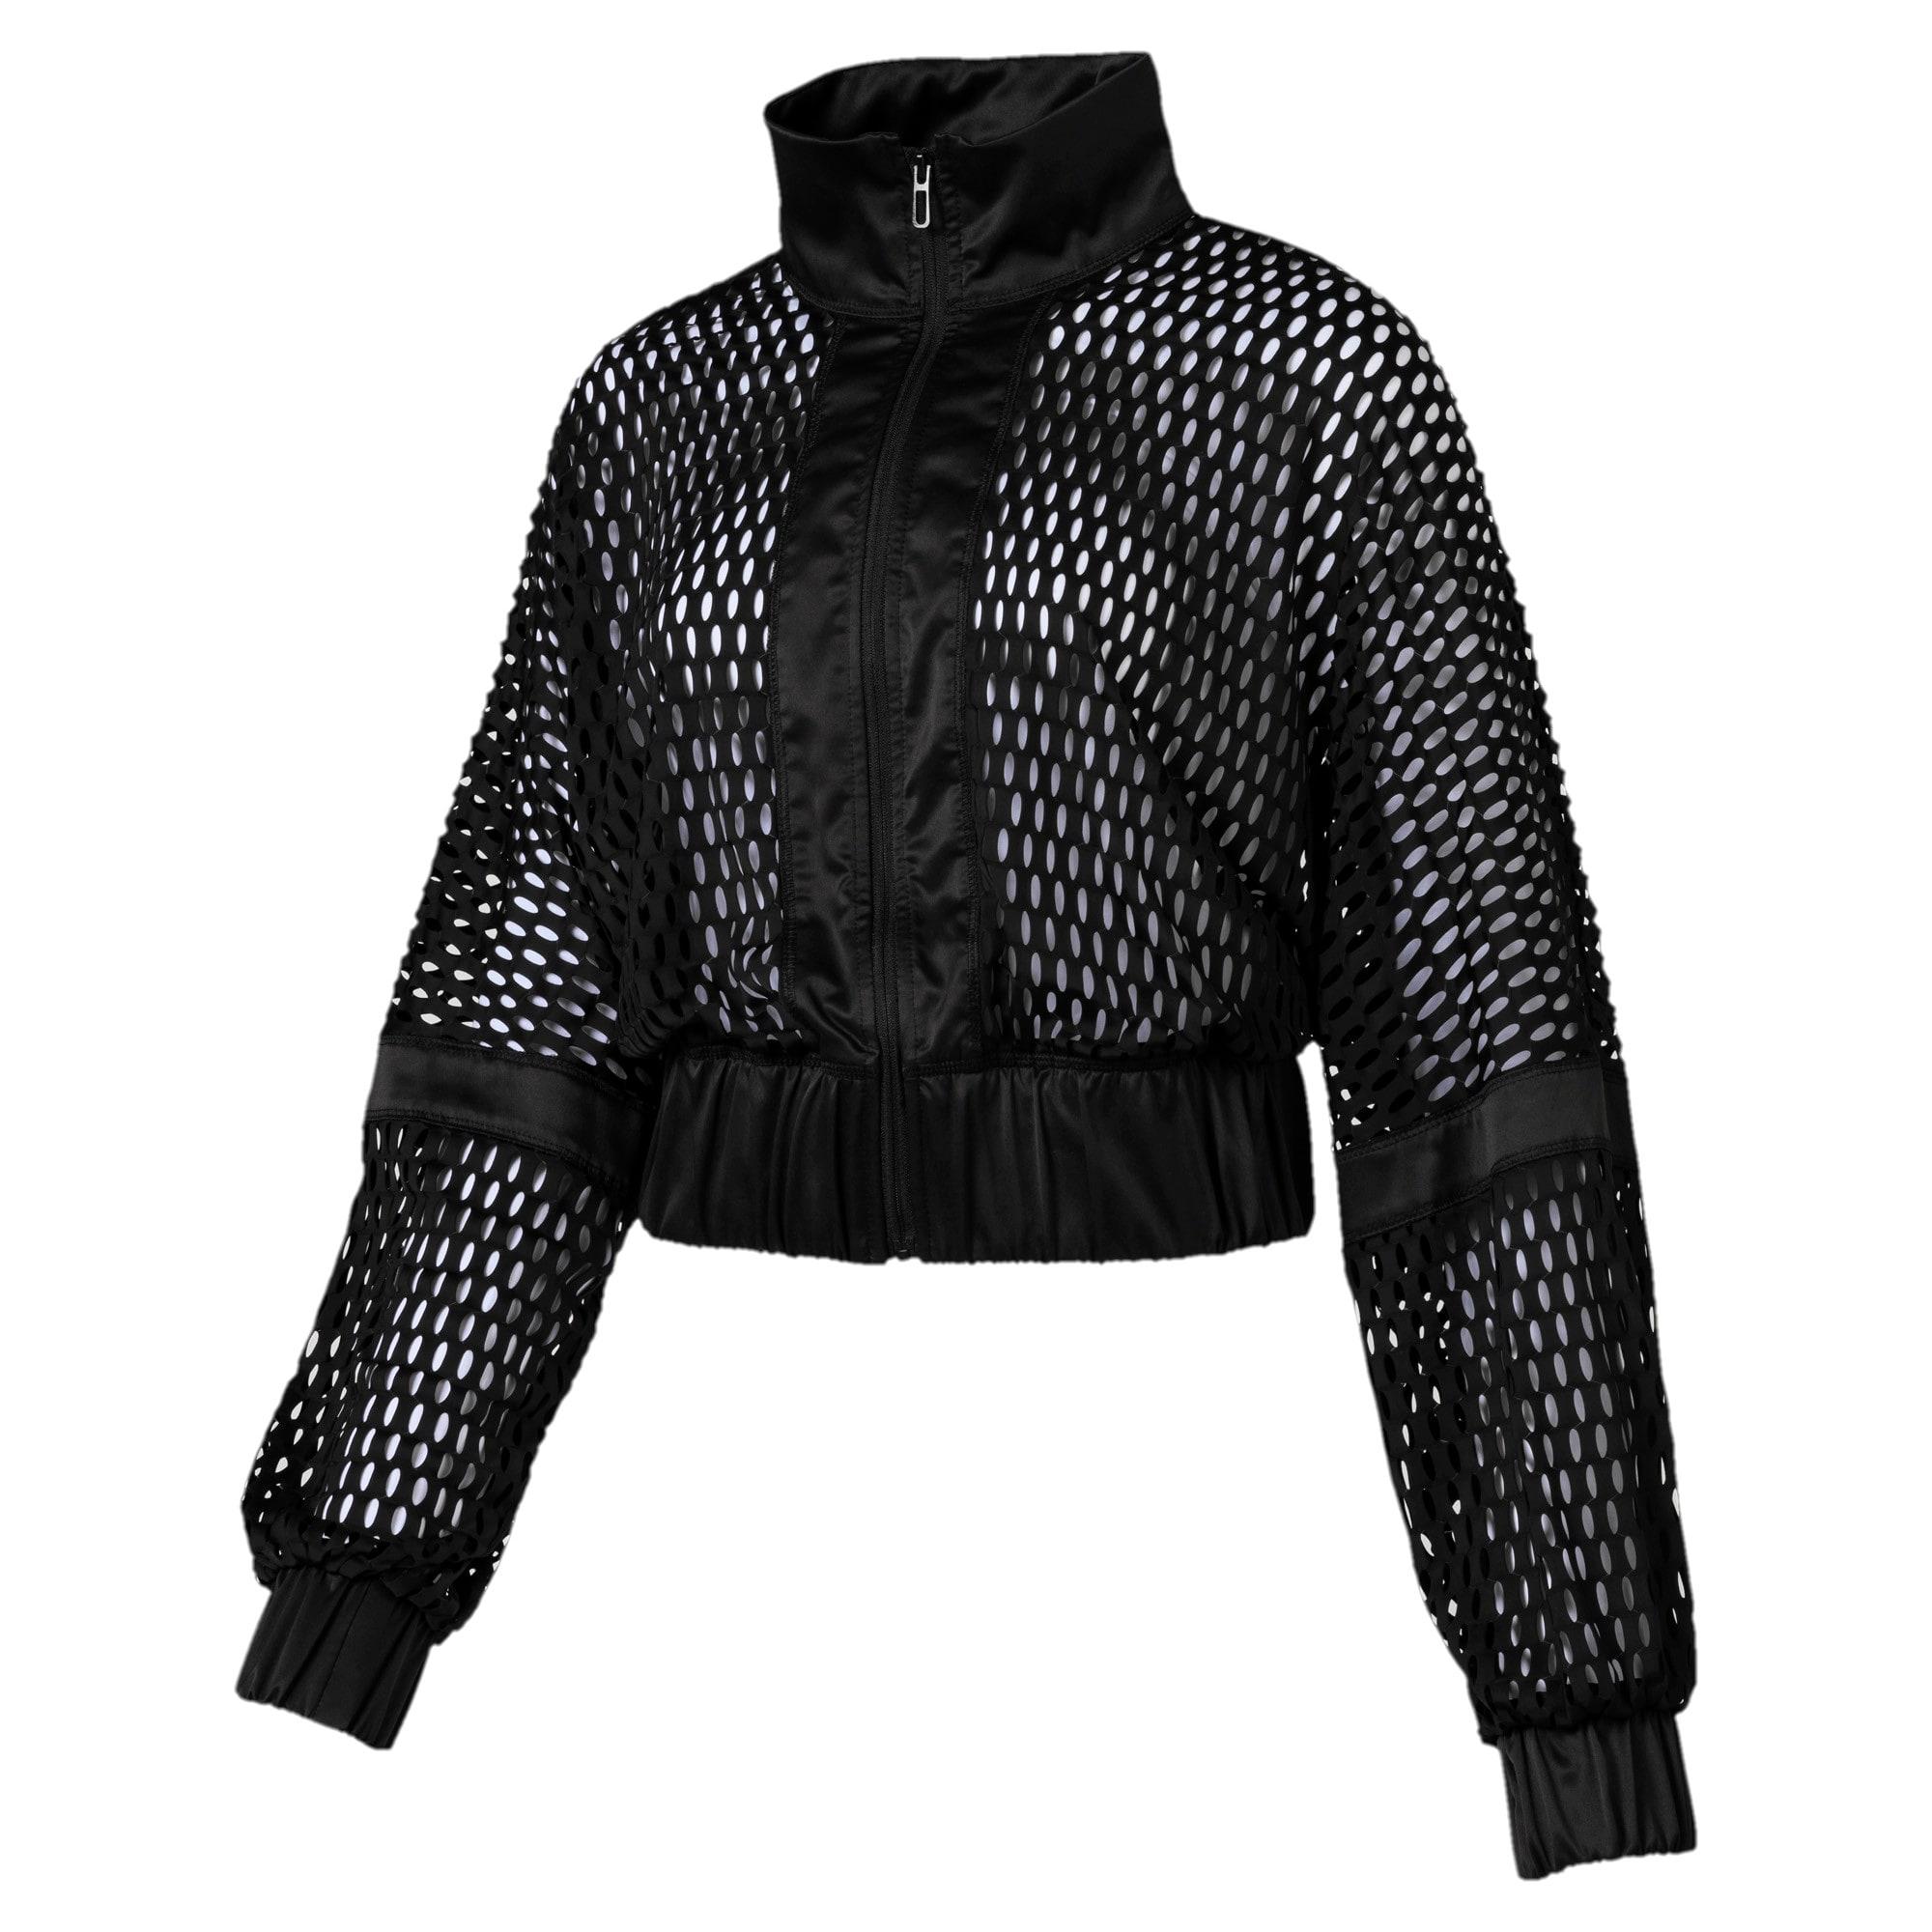 Thumbnail 3 of On the Brink Women's Knit Jacket, Puma Black, medium